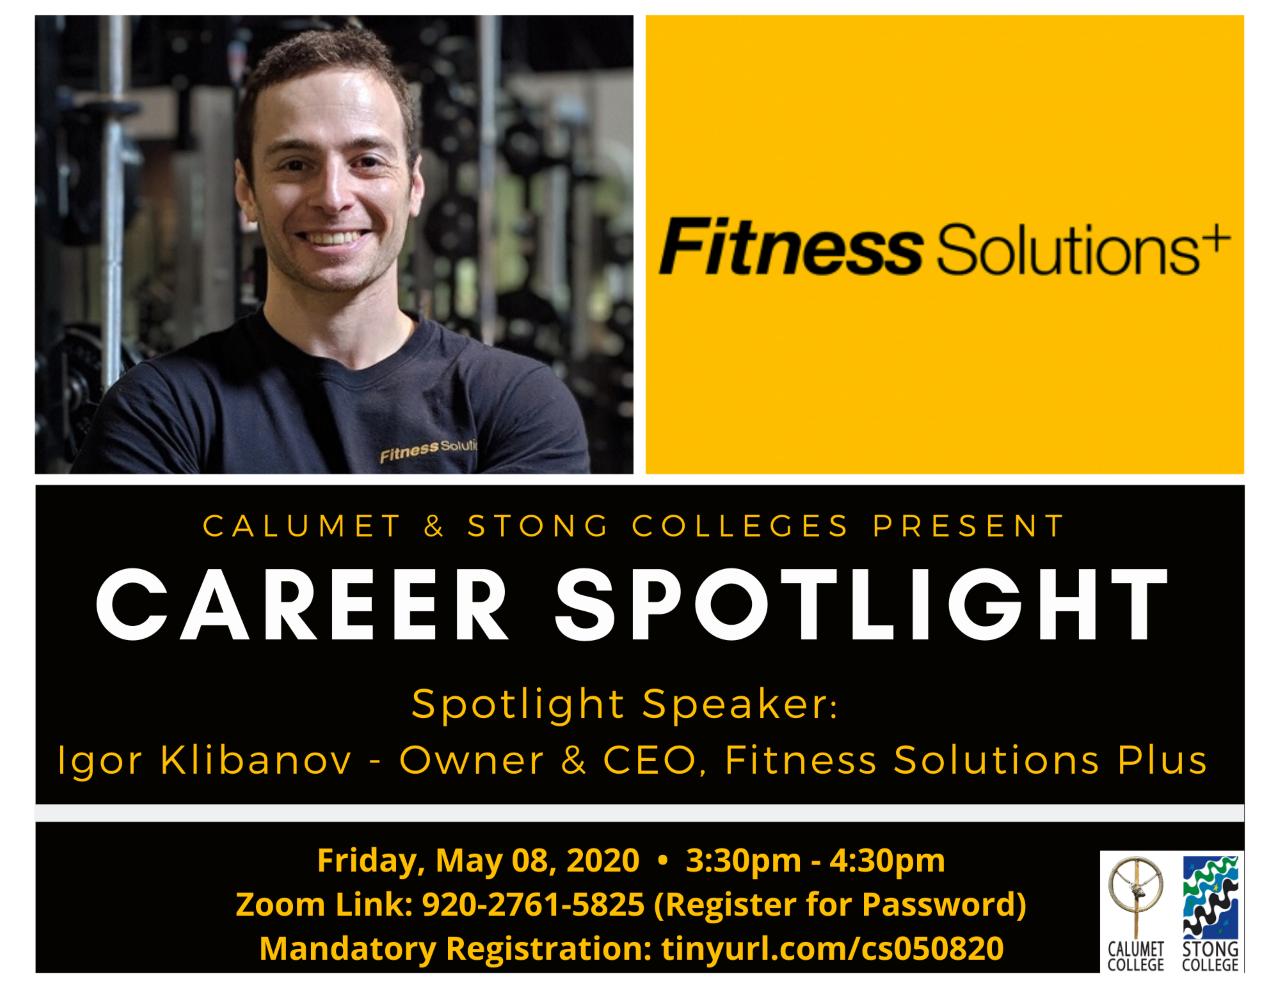 CAREER SPOTLIGHT: IGOR KLIBANOV – OWNER & CEO, FITNESS SOLUTIONS PLUS @ Zoom Meeting ID: 920-2761-5825